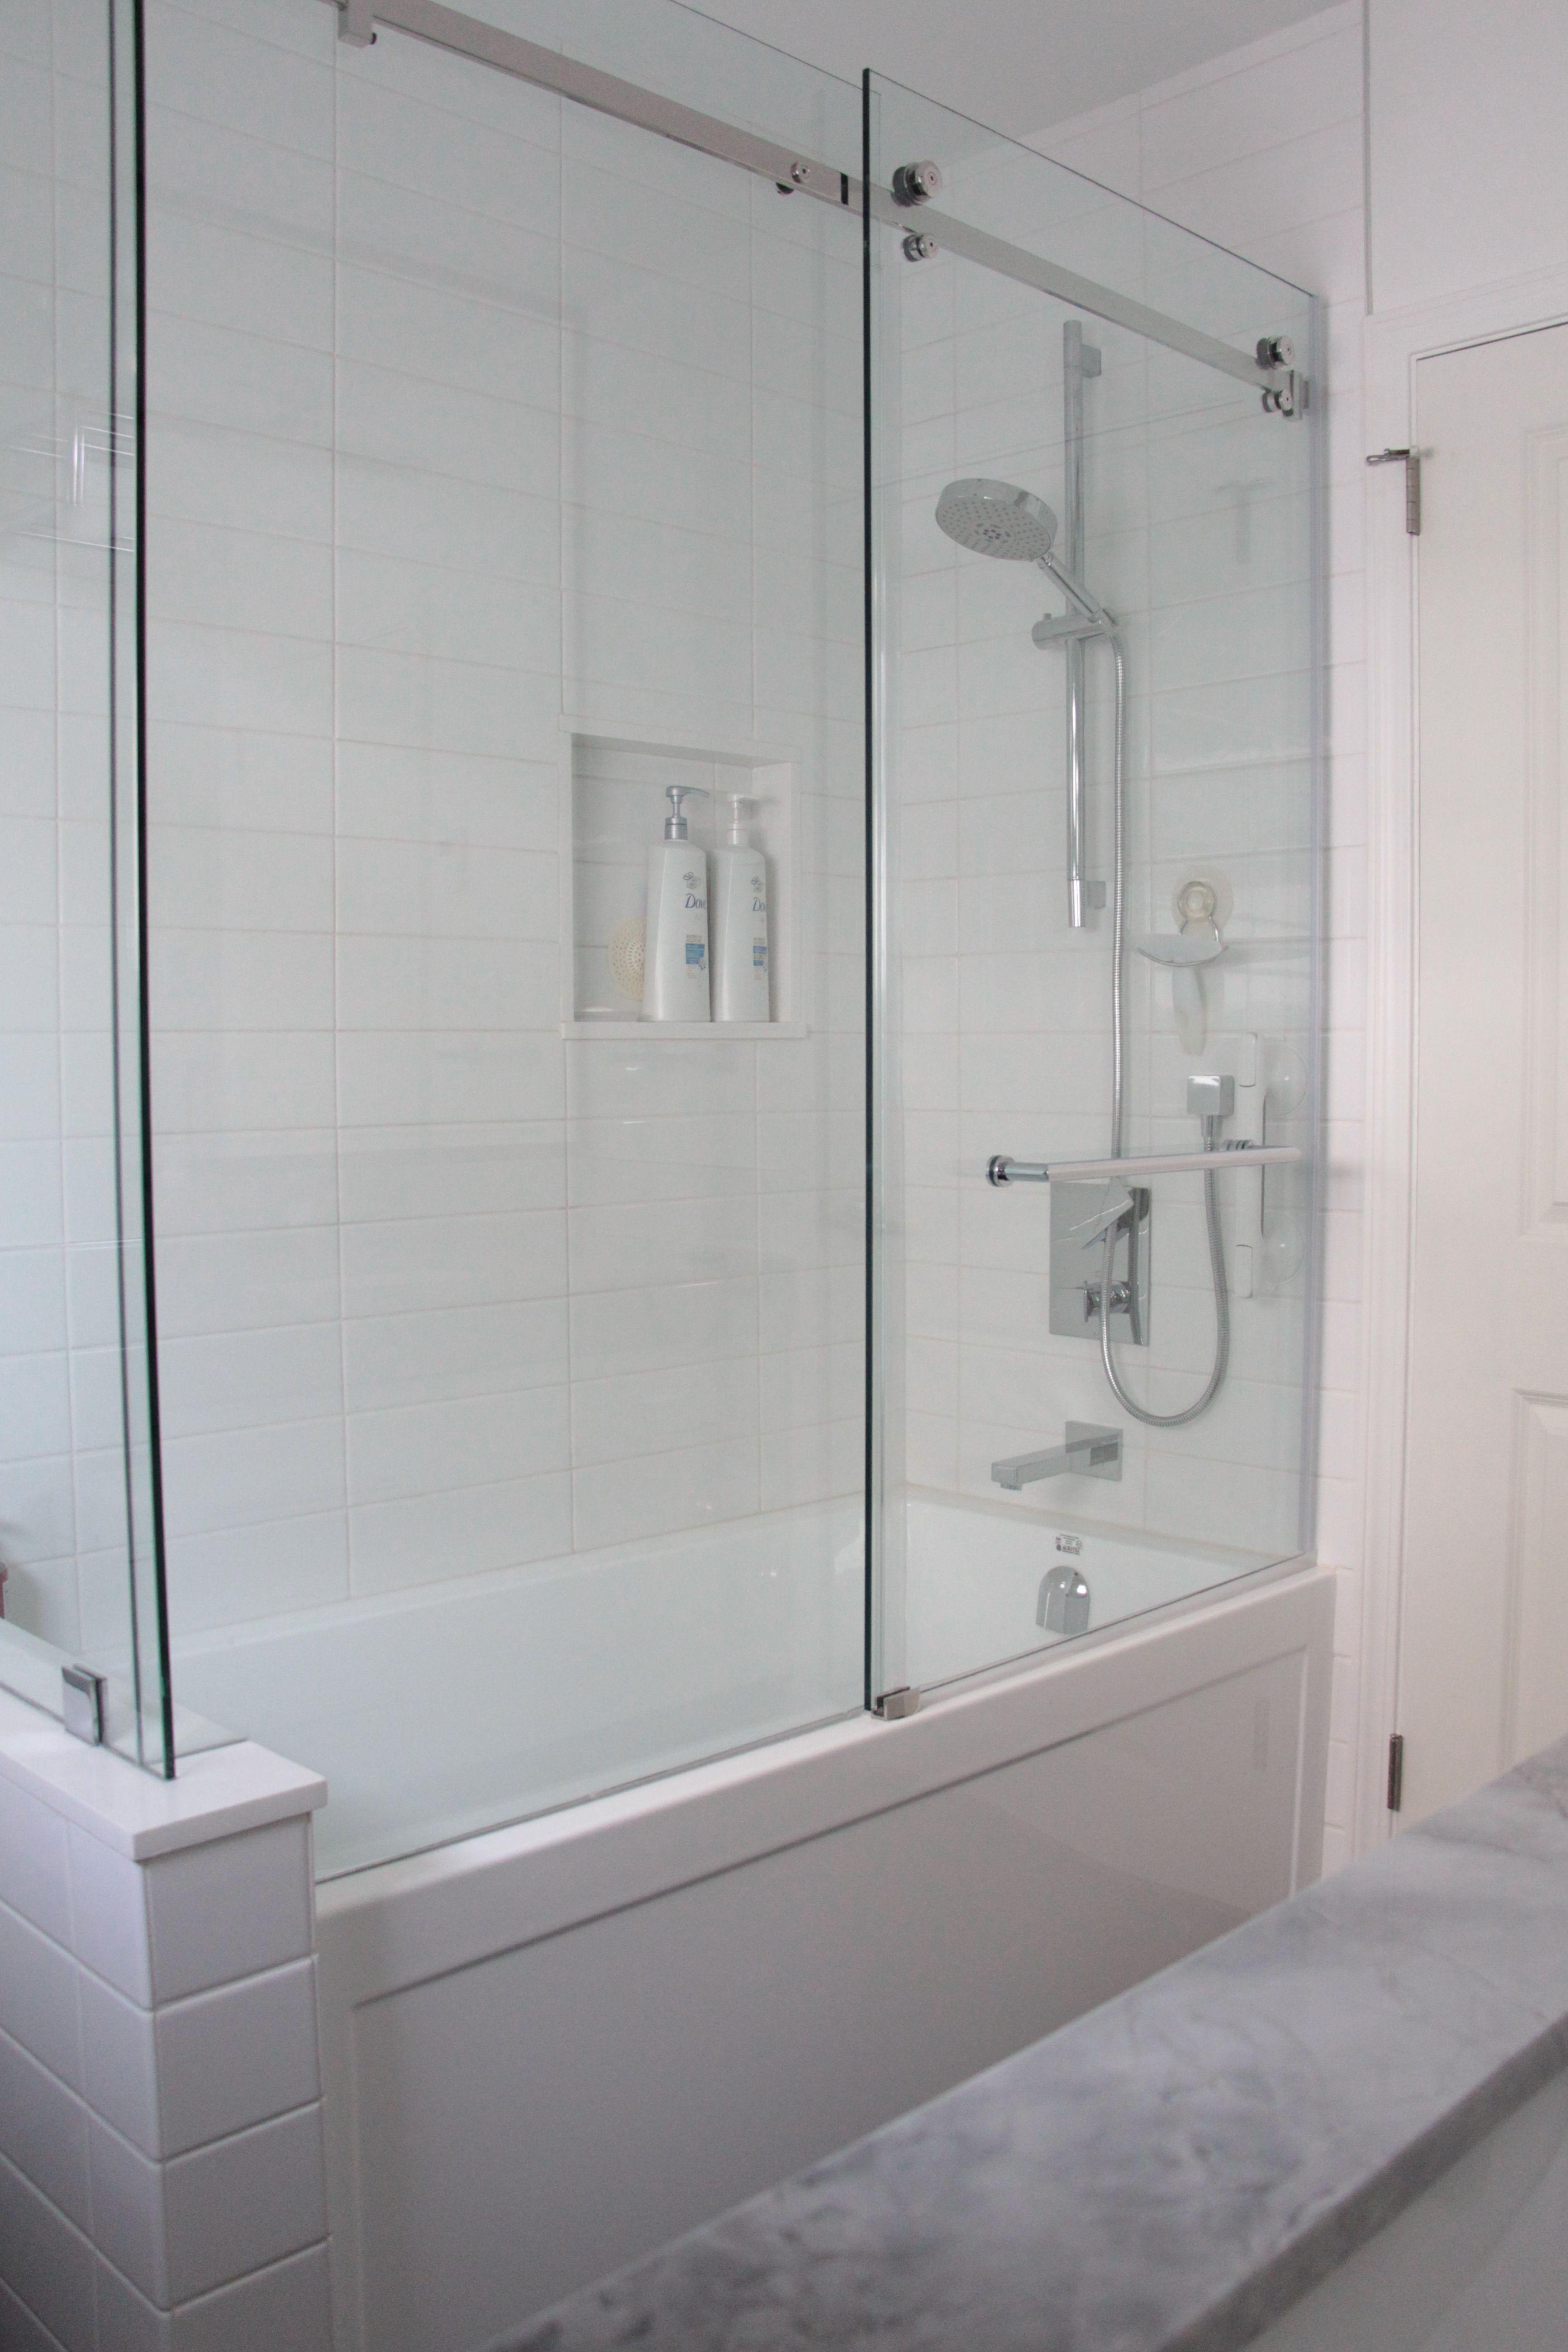 Pin By Stephanie Edwards On Ascot Bathtub Shower Doors Glass Tub Enclosure Tub Shower Doors